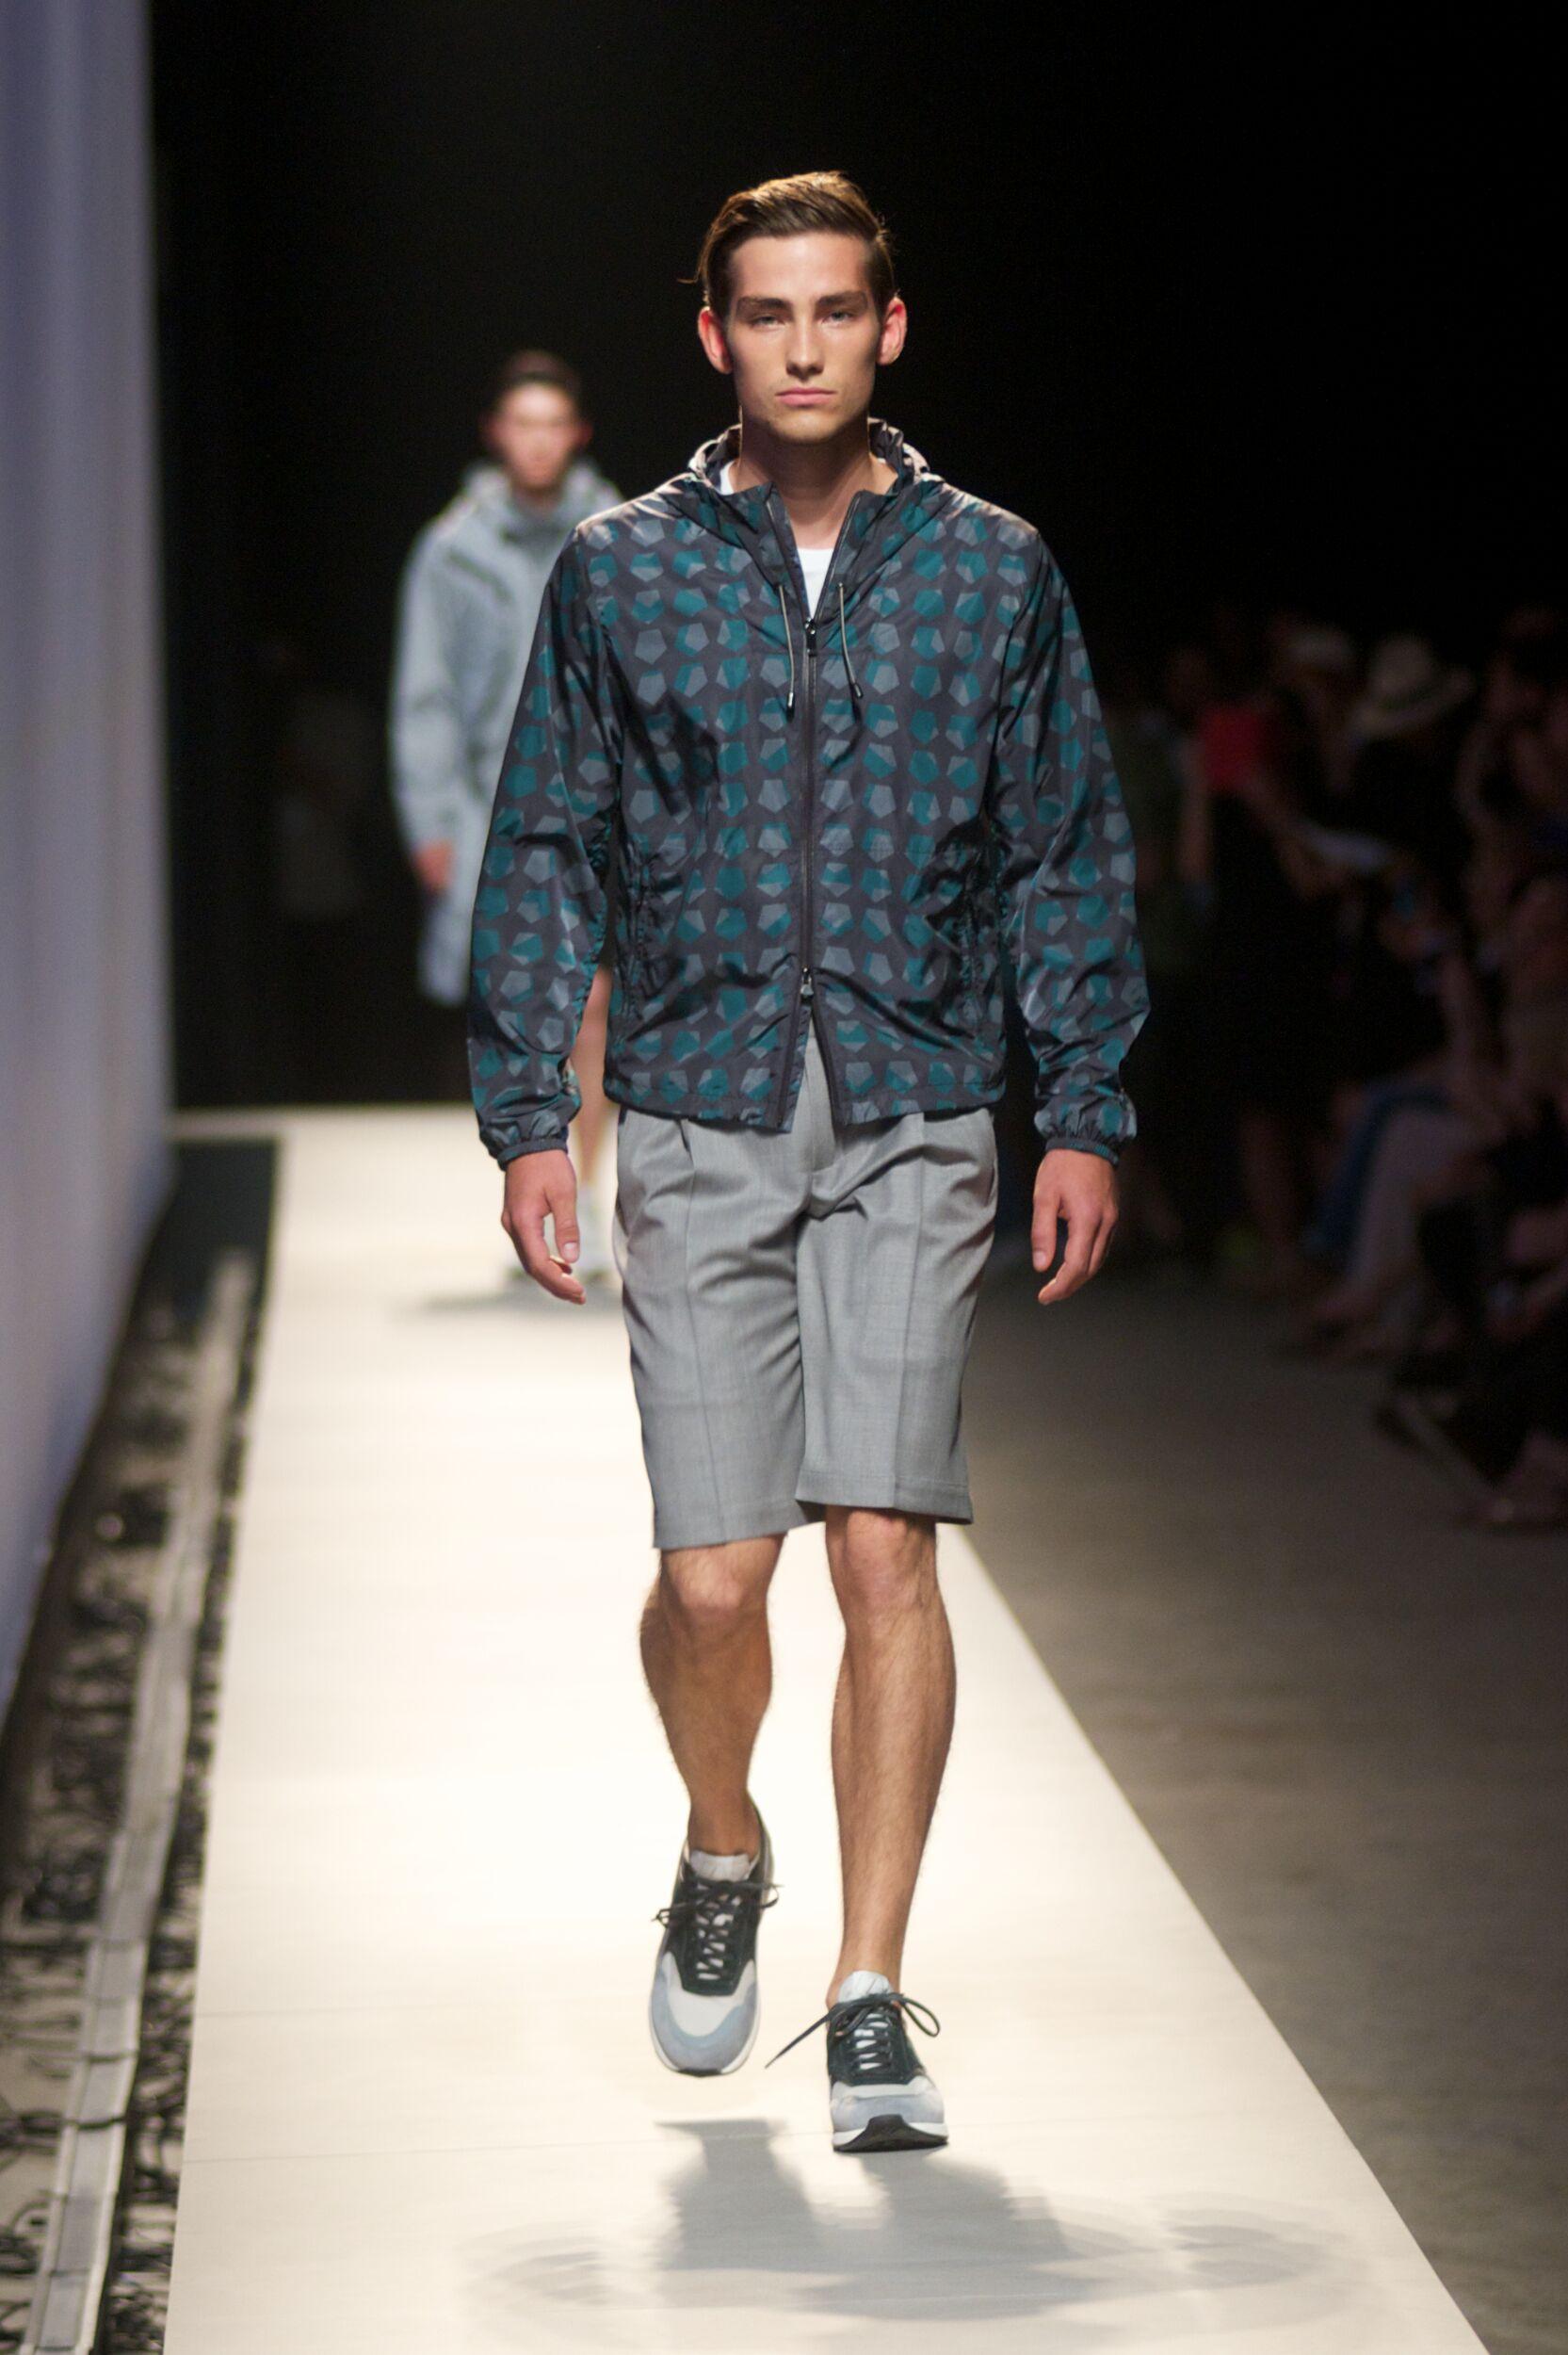 Fashion Model Z Zegna Catwalk